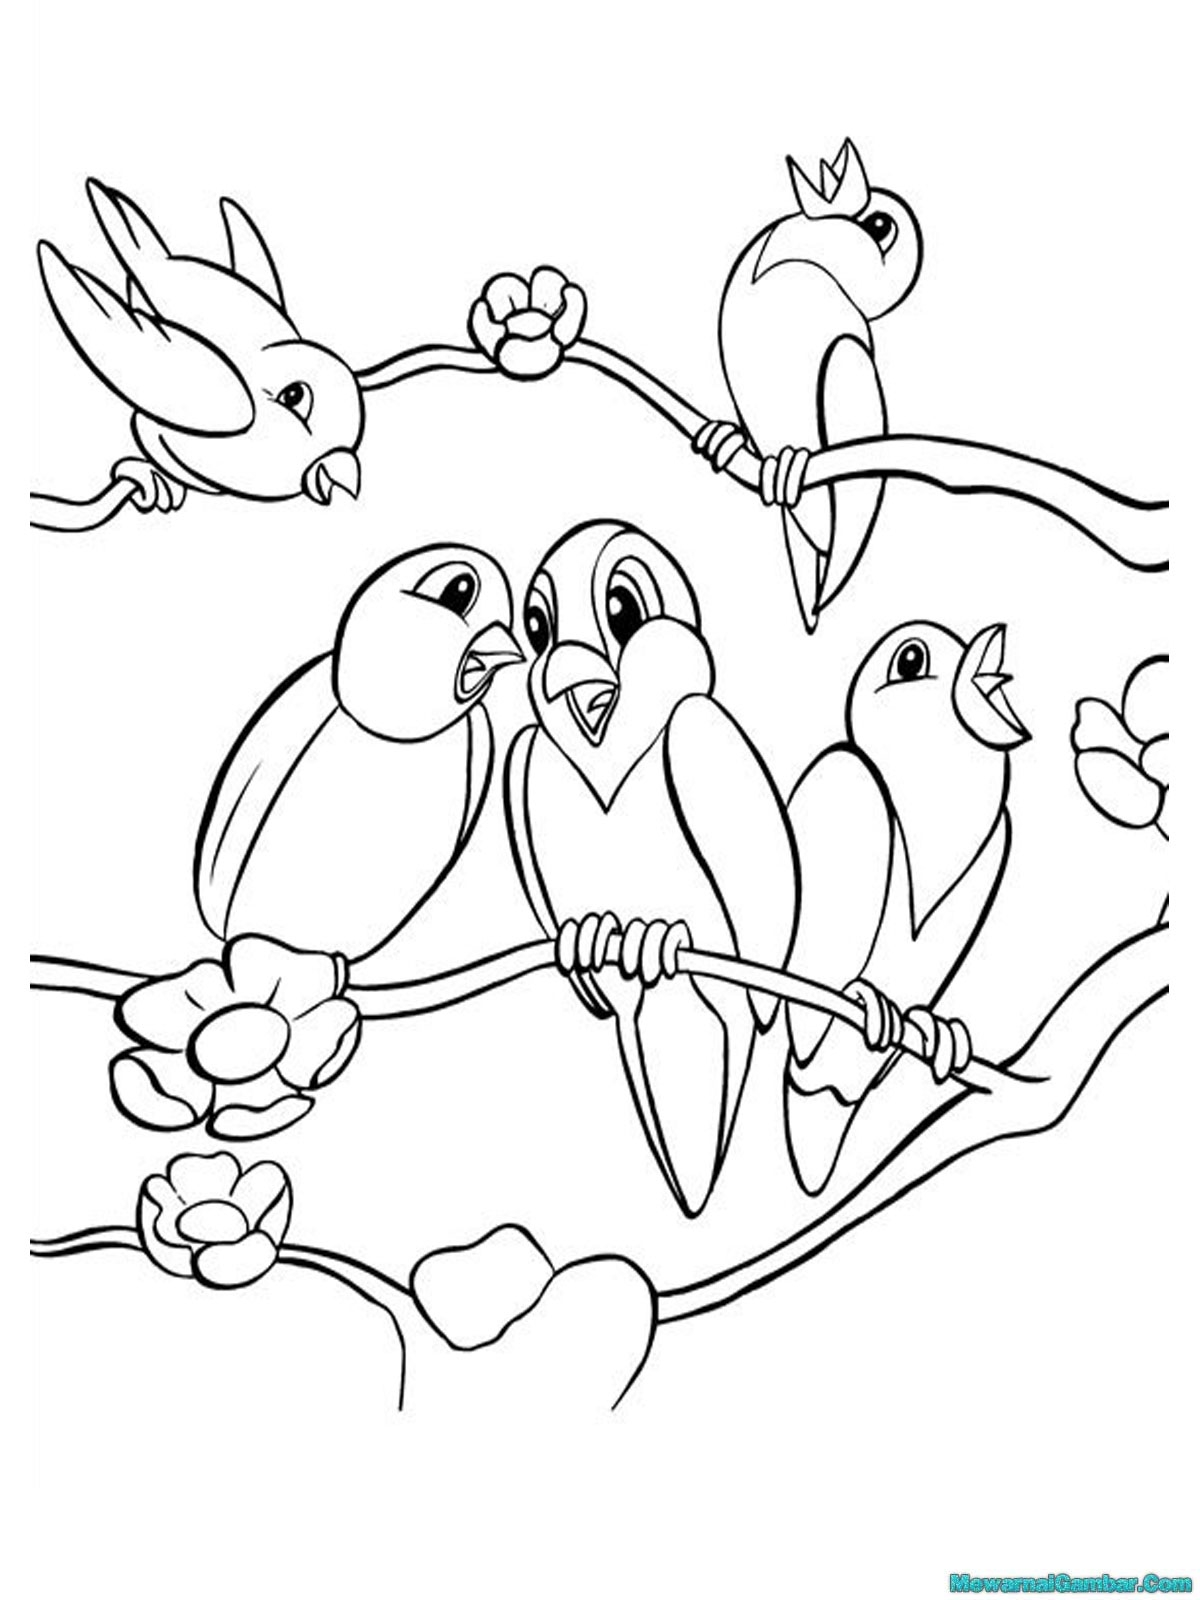 Kumpulan Gambar Sketsa Burung Lb | Sketsabaru